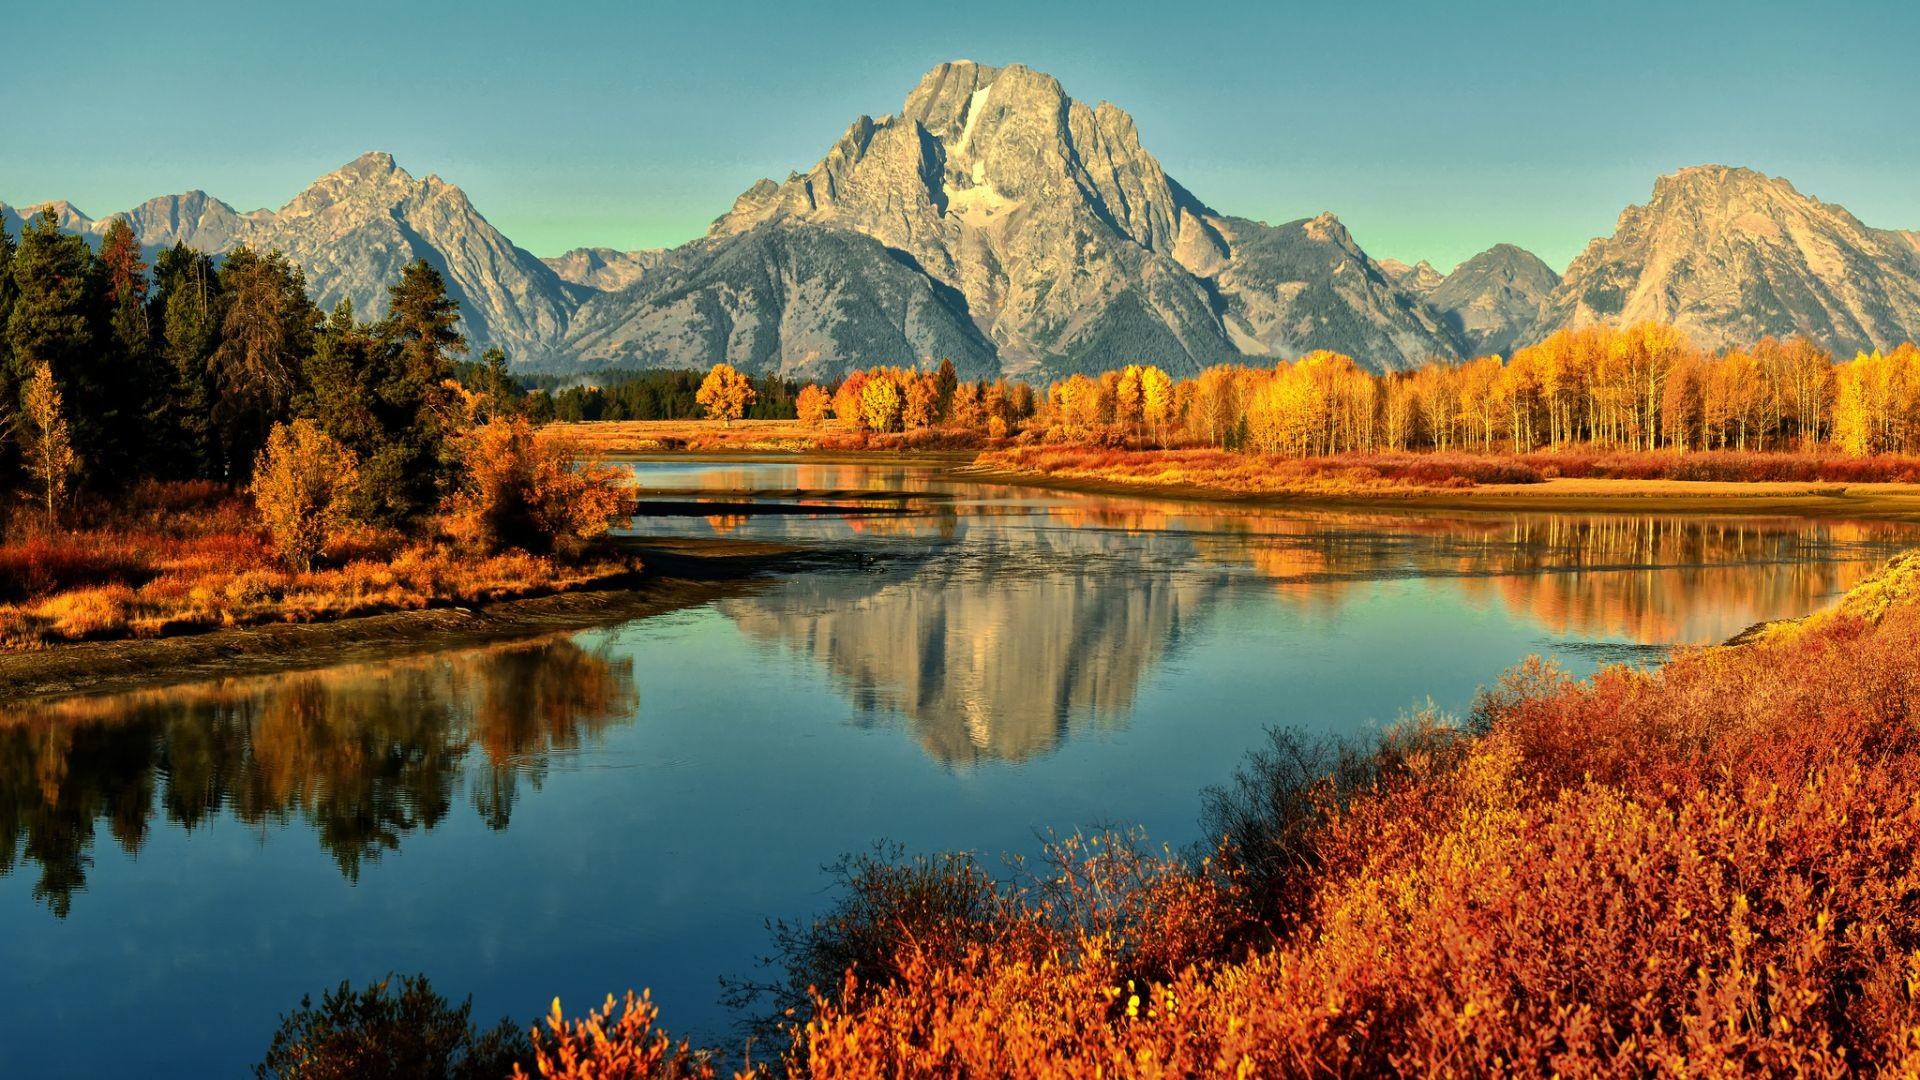 Amazing scenery wallpapers - Nature wallpaper vertical ...